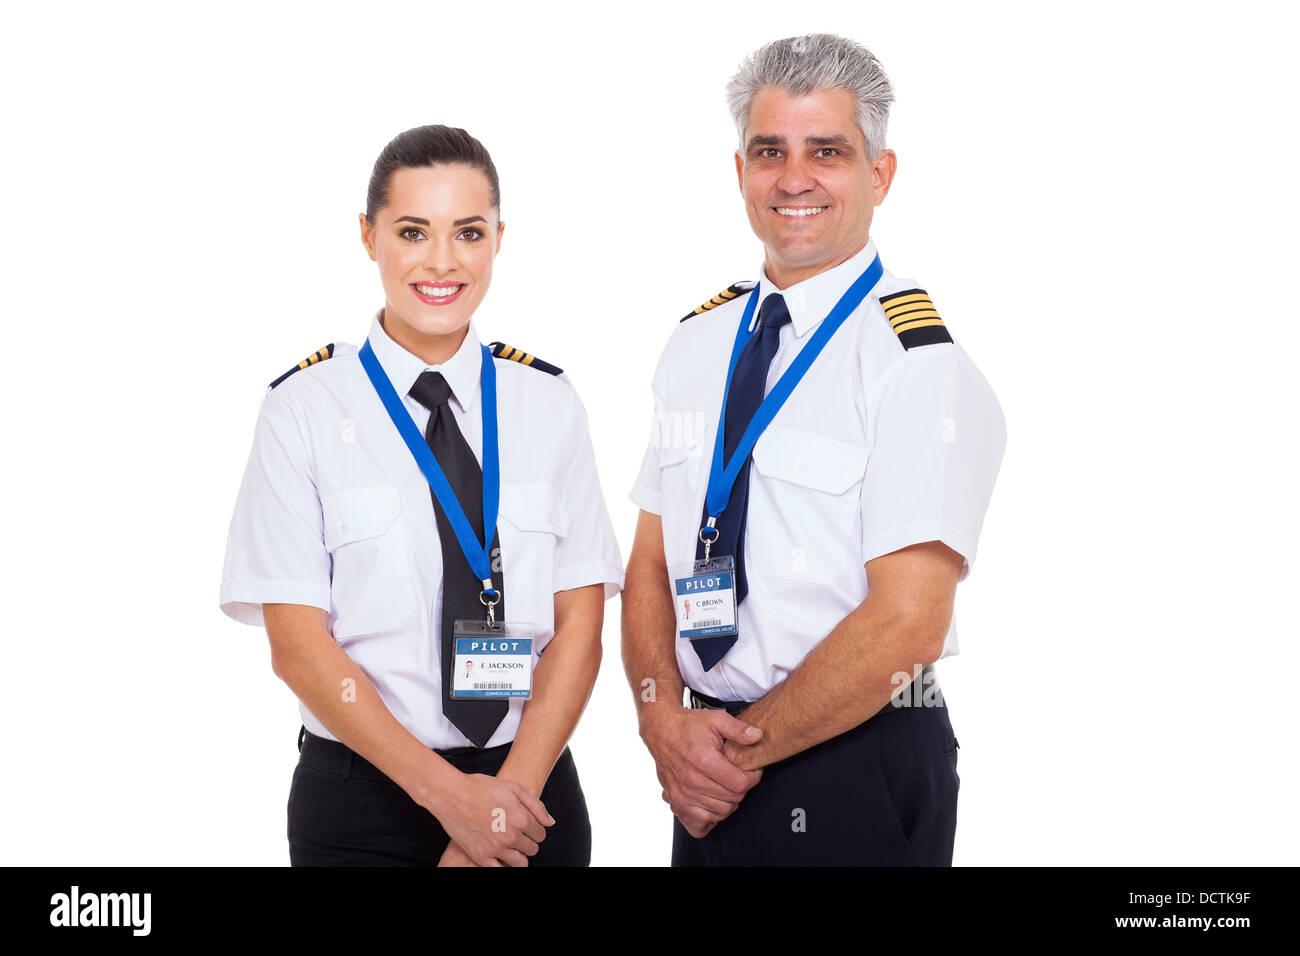 Aerolínea comercial profesional capitán y primer oficial retrato sobre fondo blanco. Imagen De Stock